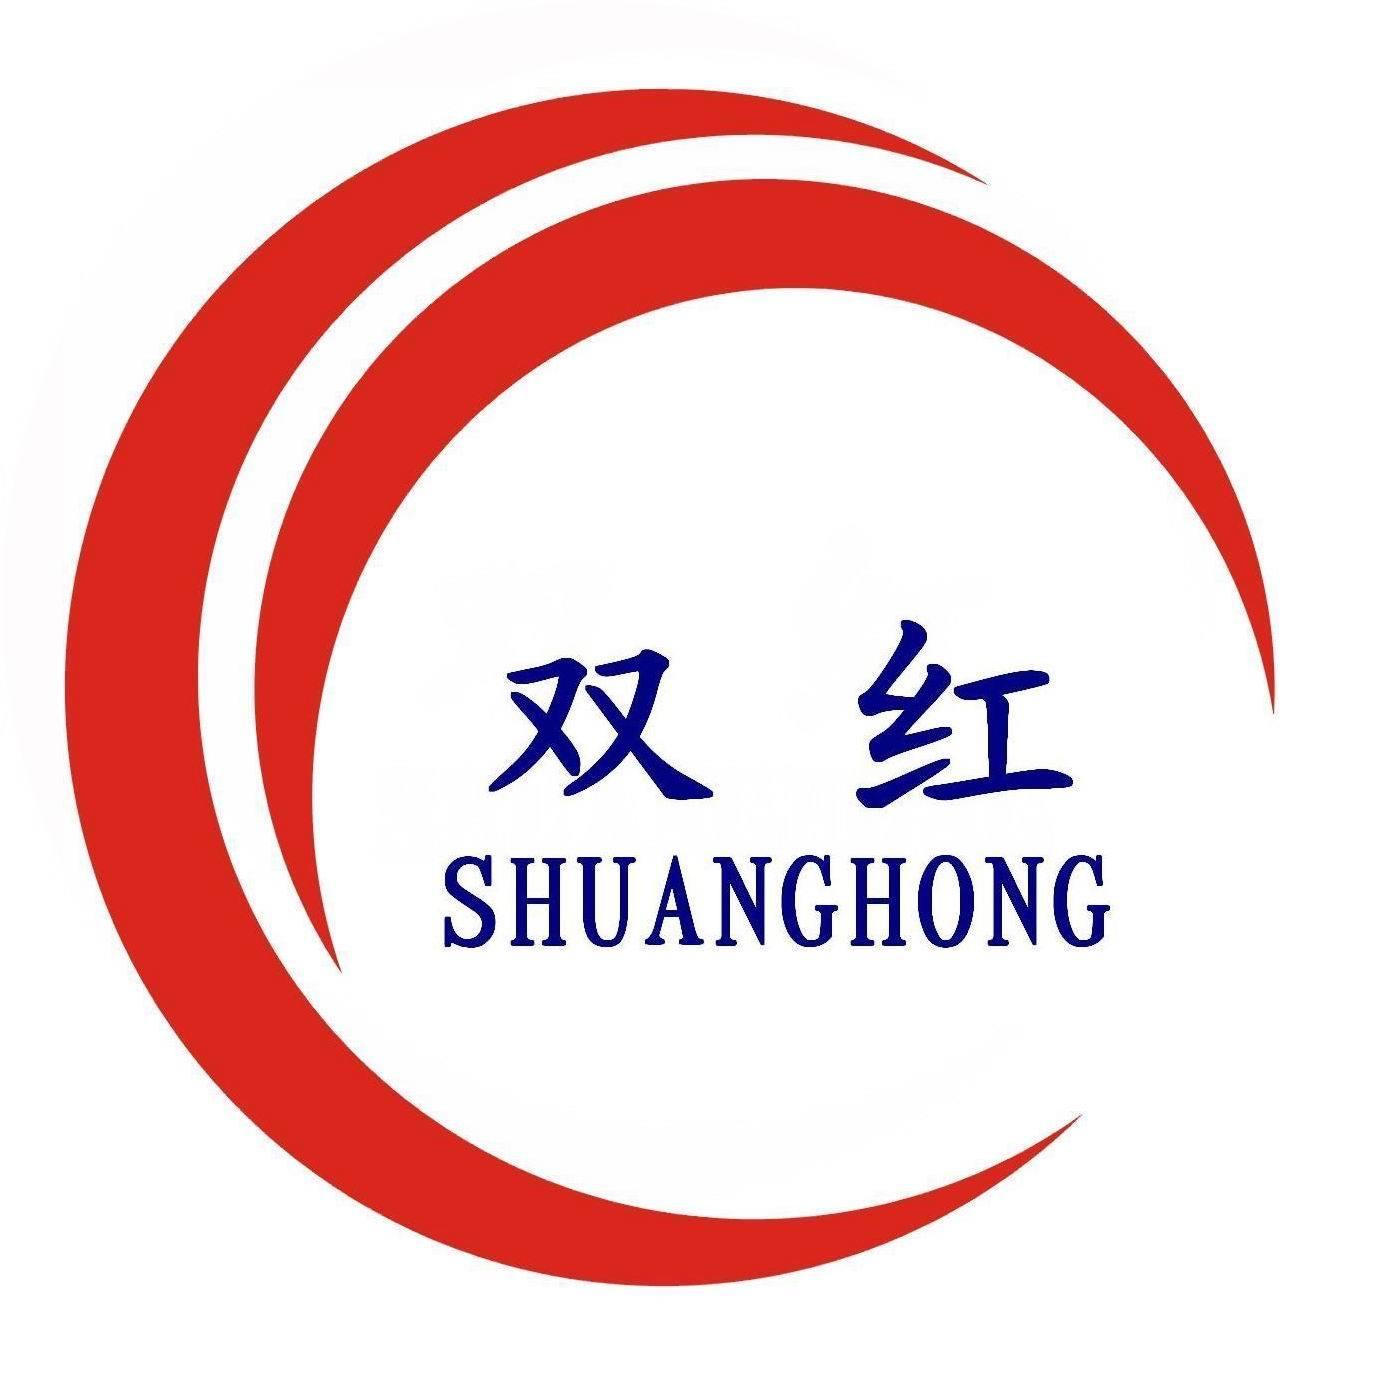 logo logo 标识 标志 设计 图标 1377_1377